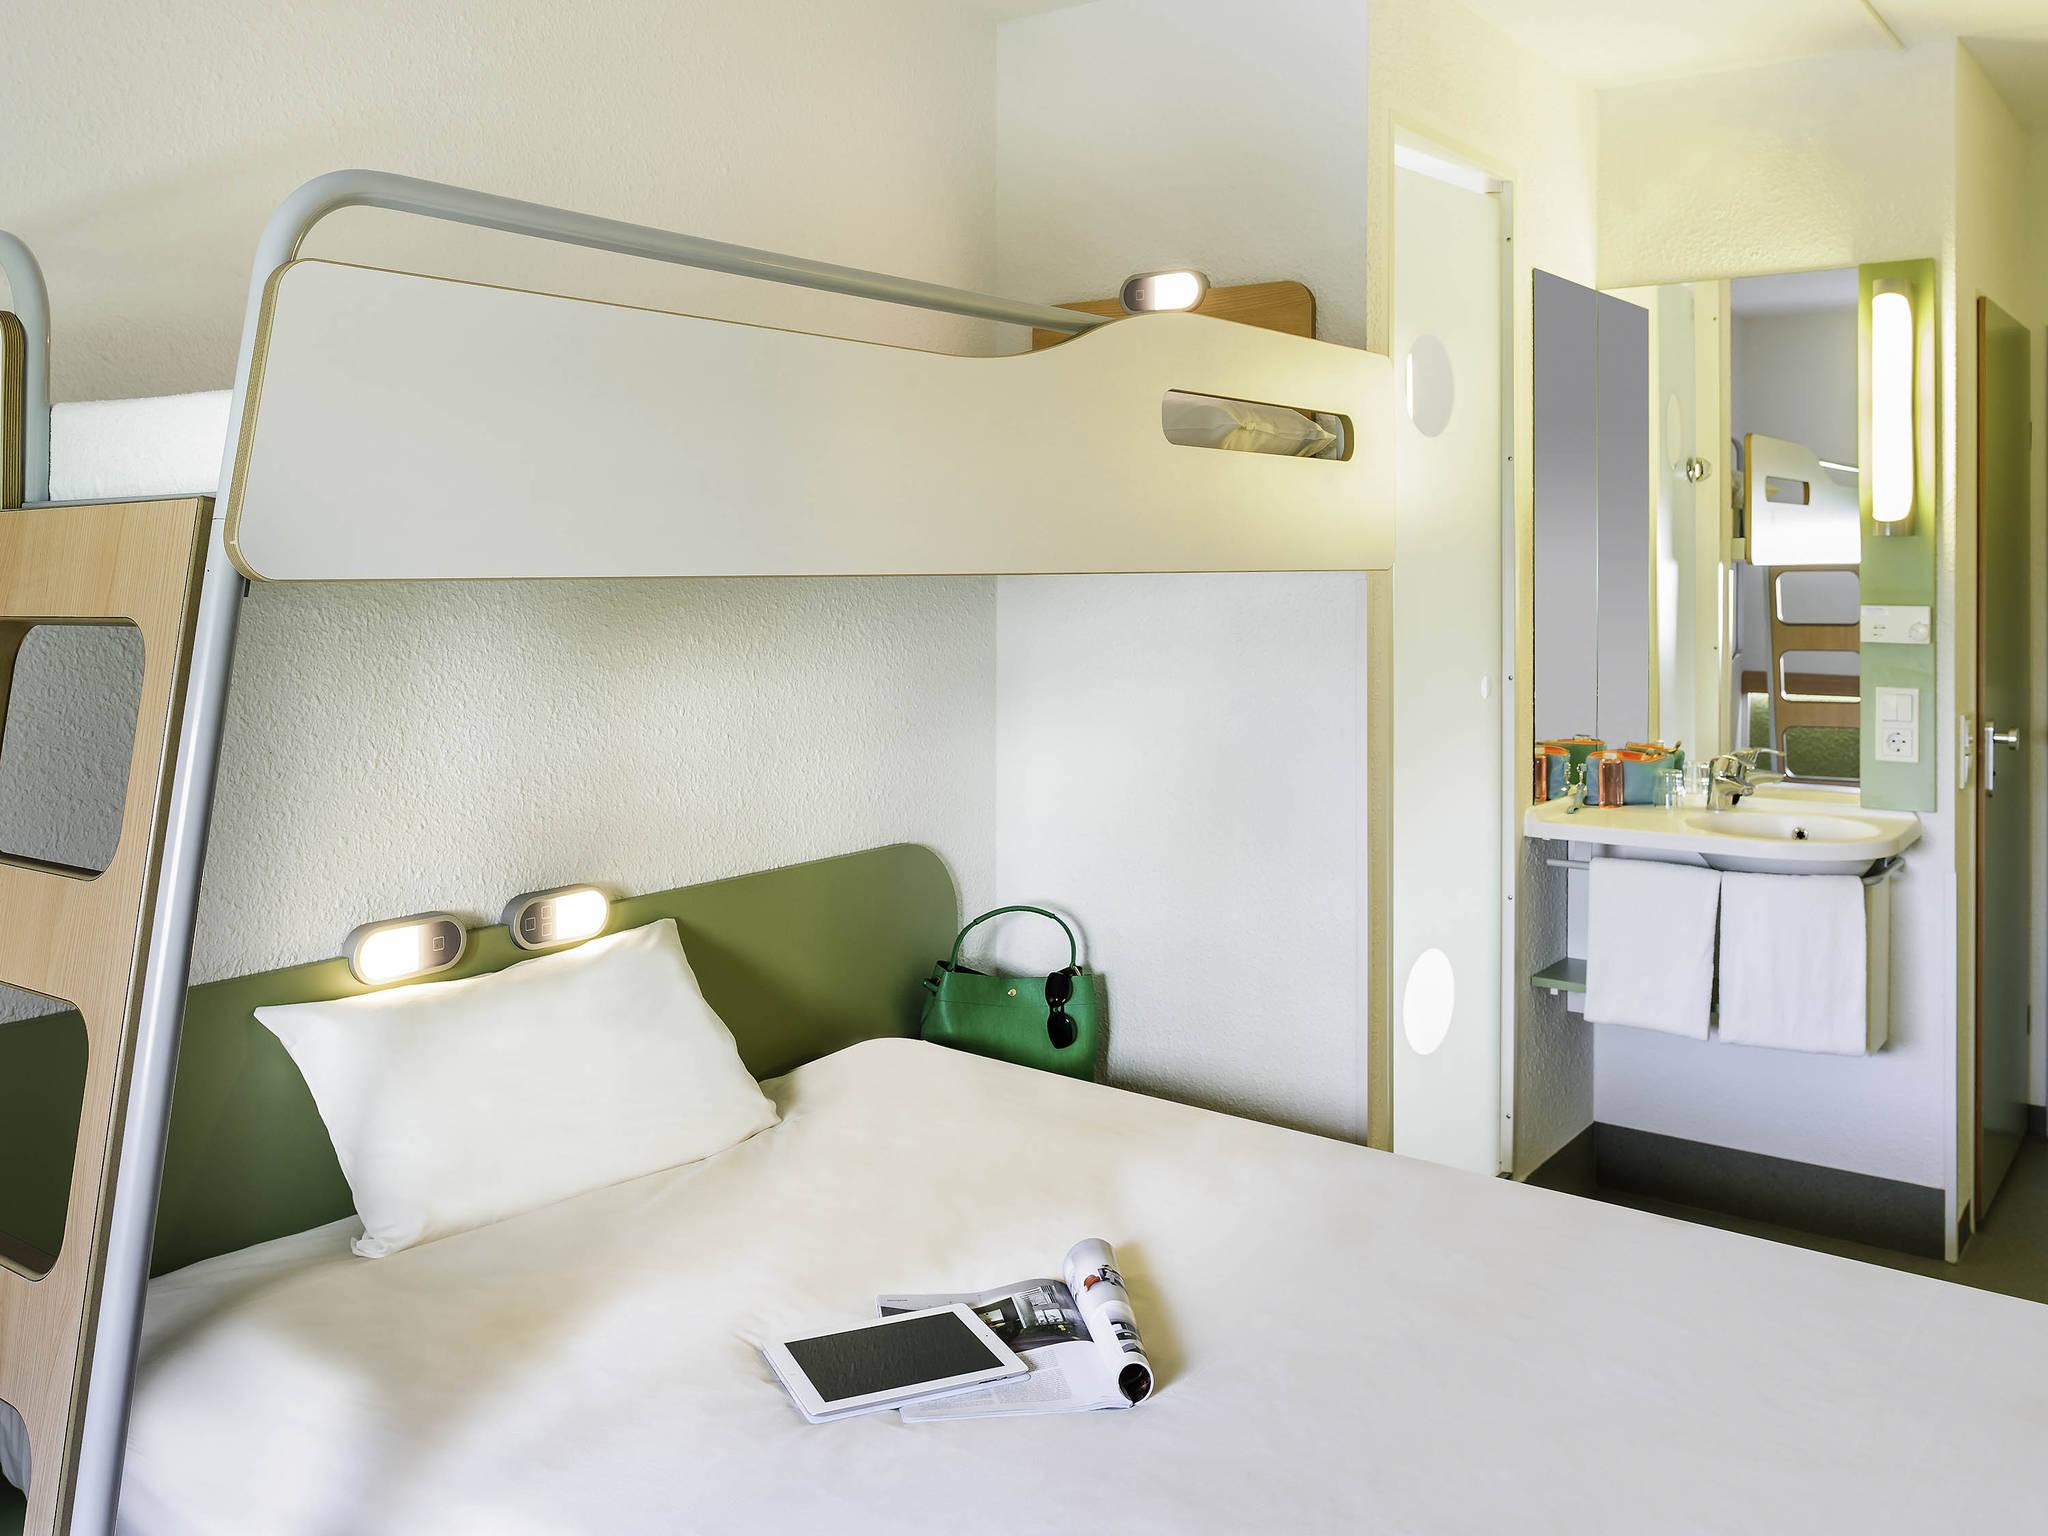 ... Rooms - ibis budget Hamburg Altona ... & Hotel ibis budget Hamburg Altona. Book now! Free Wifi!